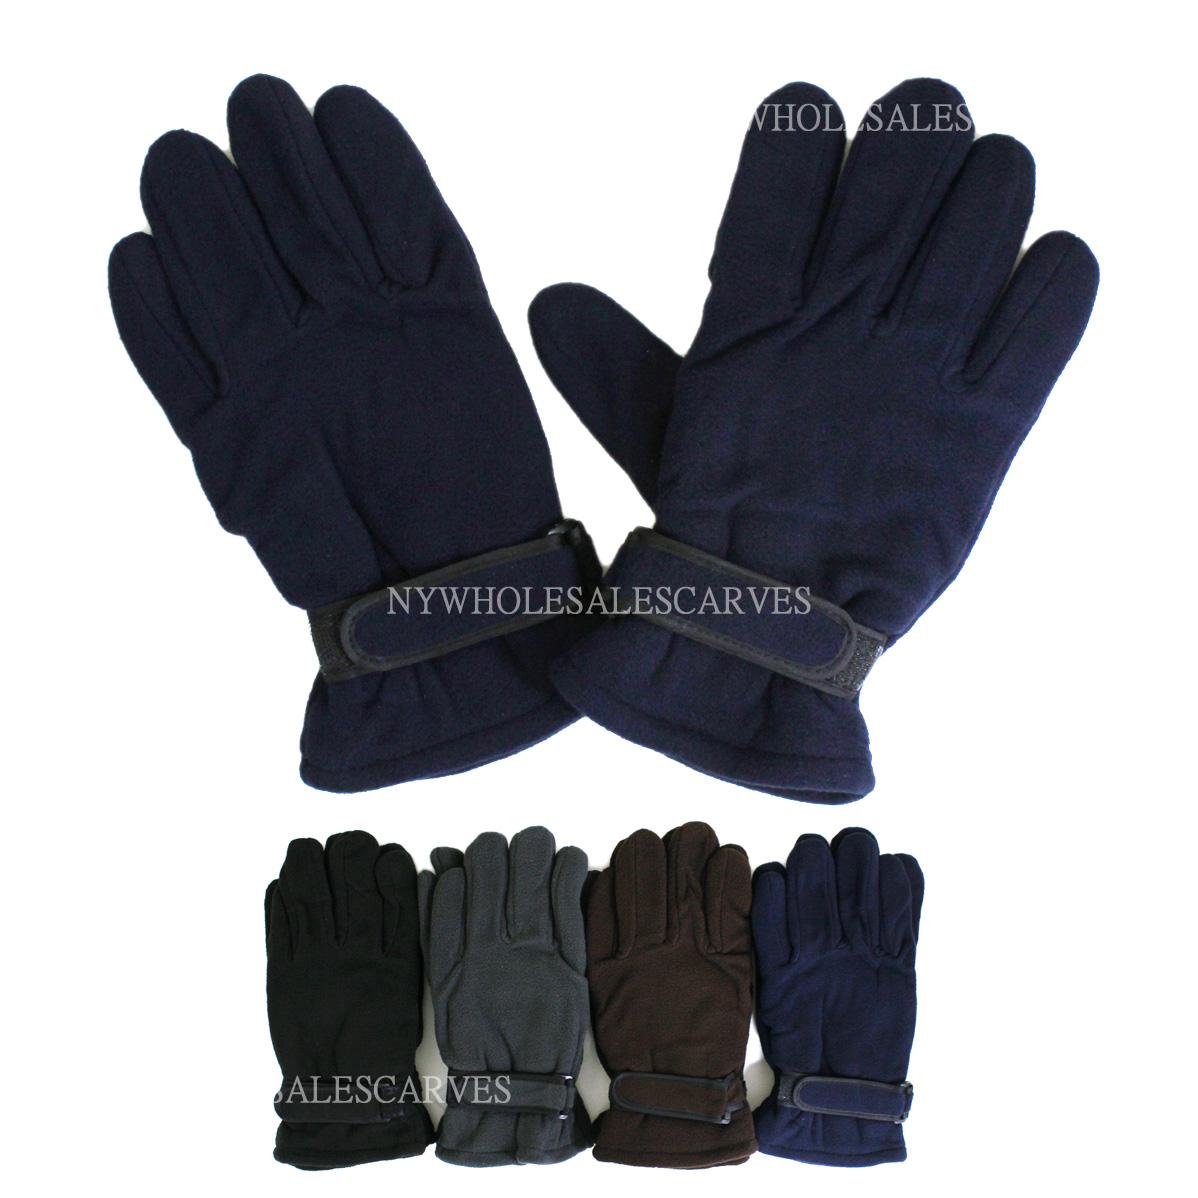 fleece winter gloves s gl01 4 colors 1doz gl01